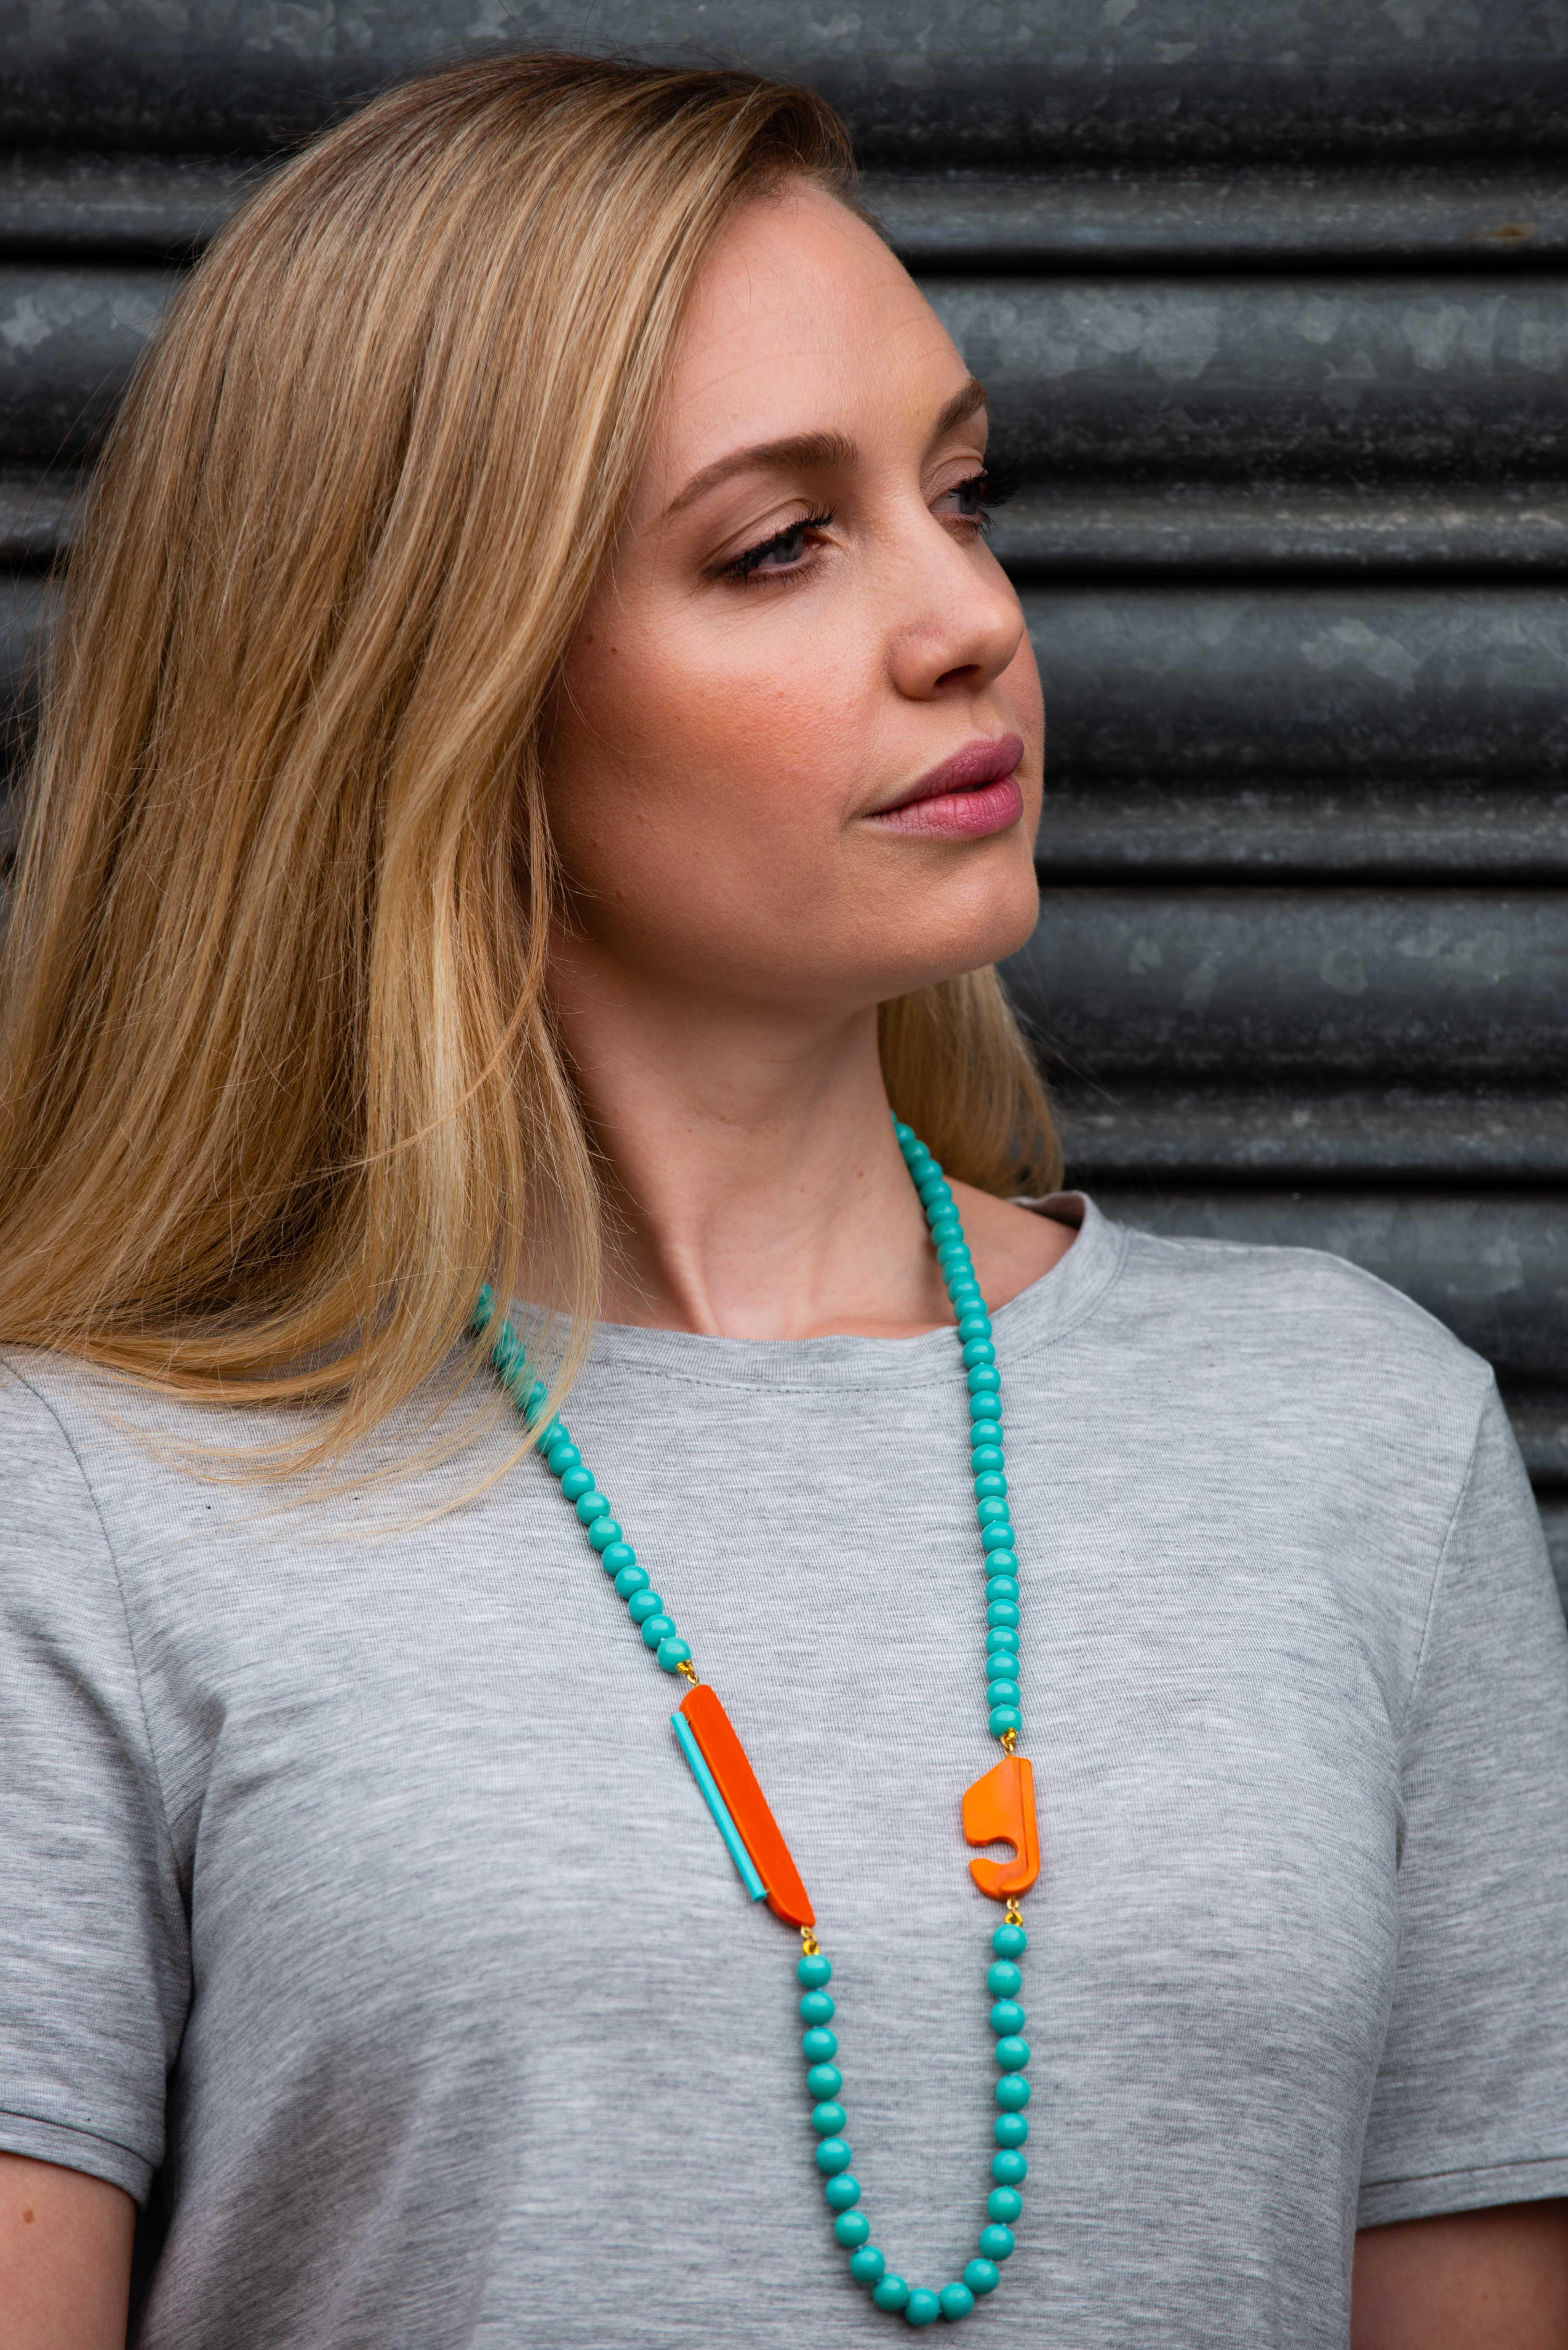 Turquoise and Orange Necklace